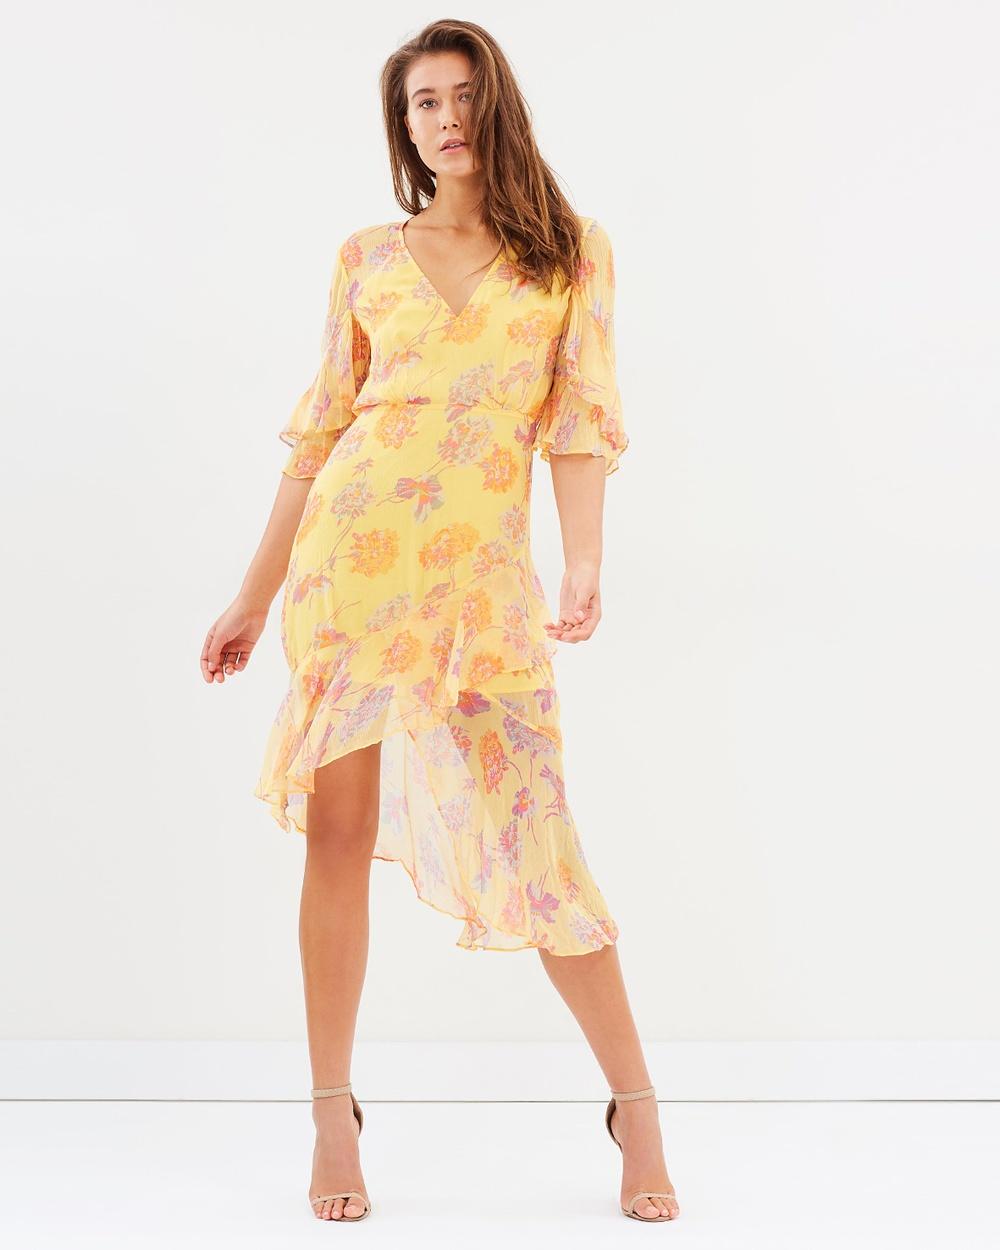 Talulah Cerulean Midi Dress Printed Dresses Yellow Vintage Floral Cerulean Midi Dress